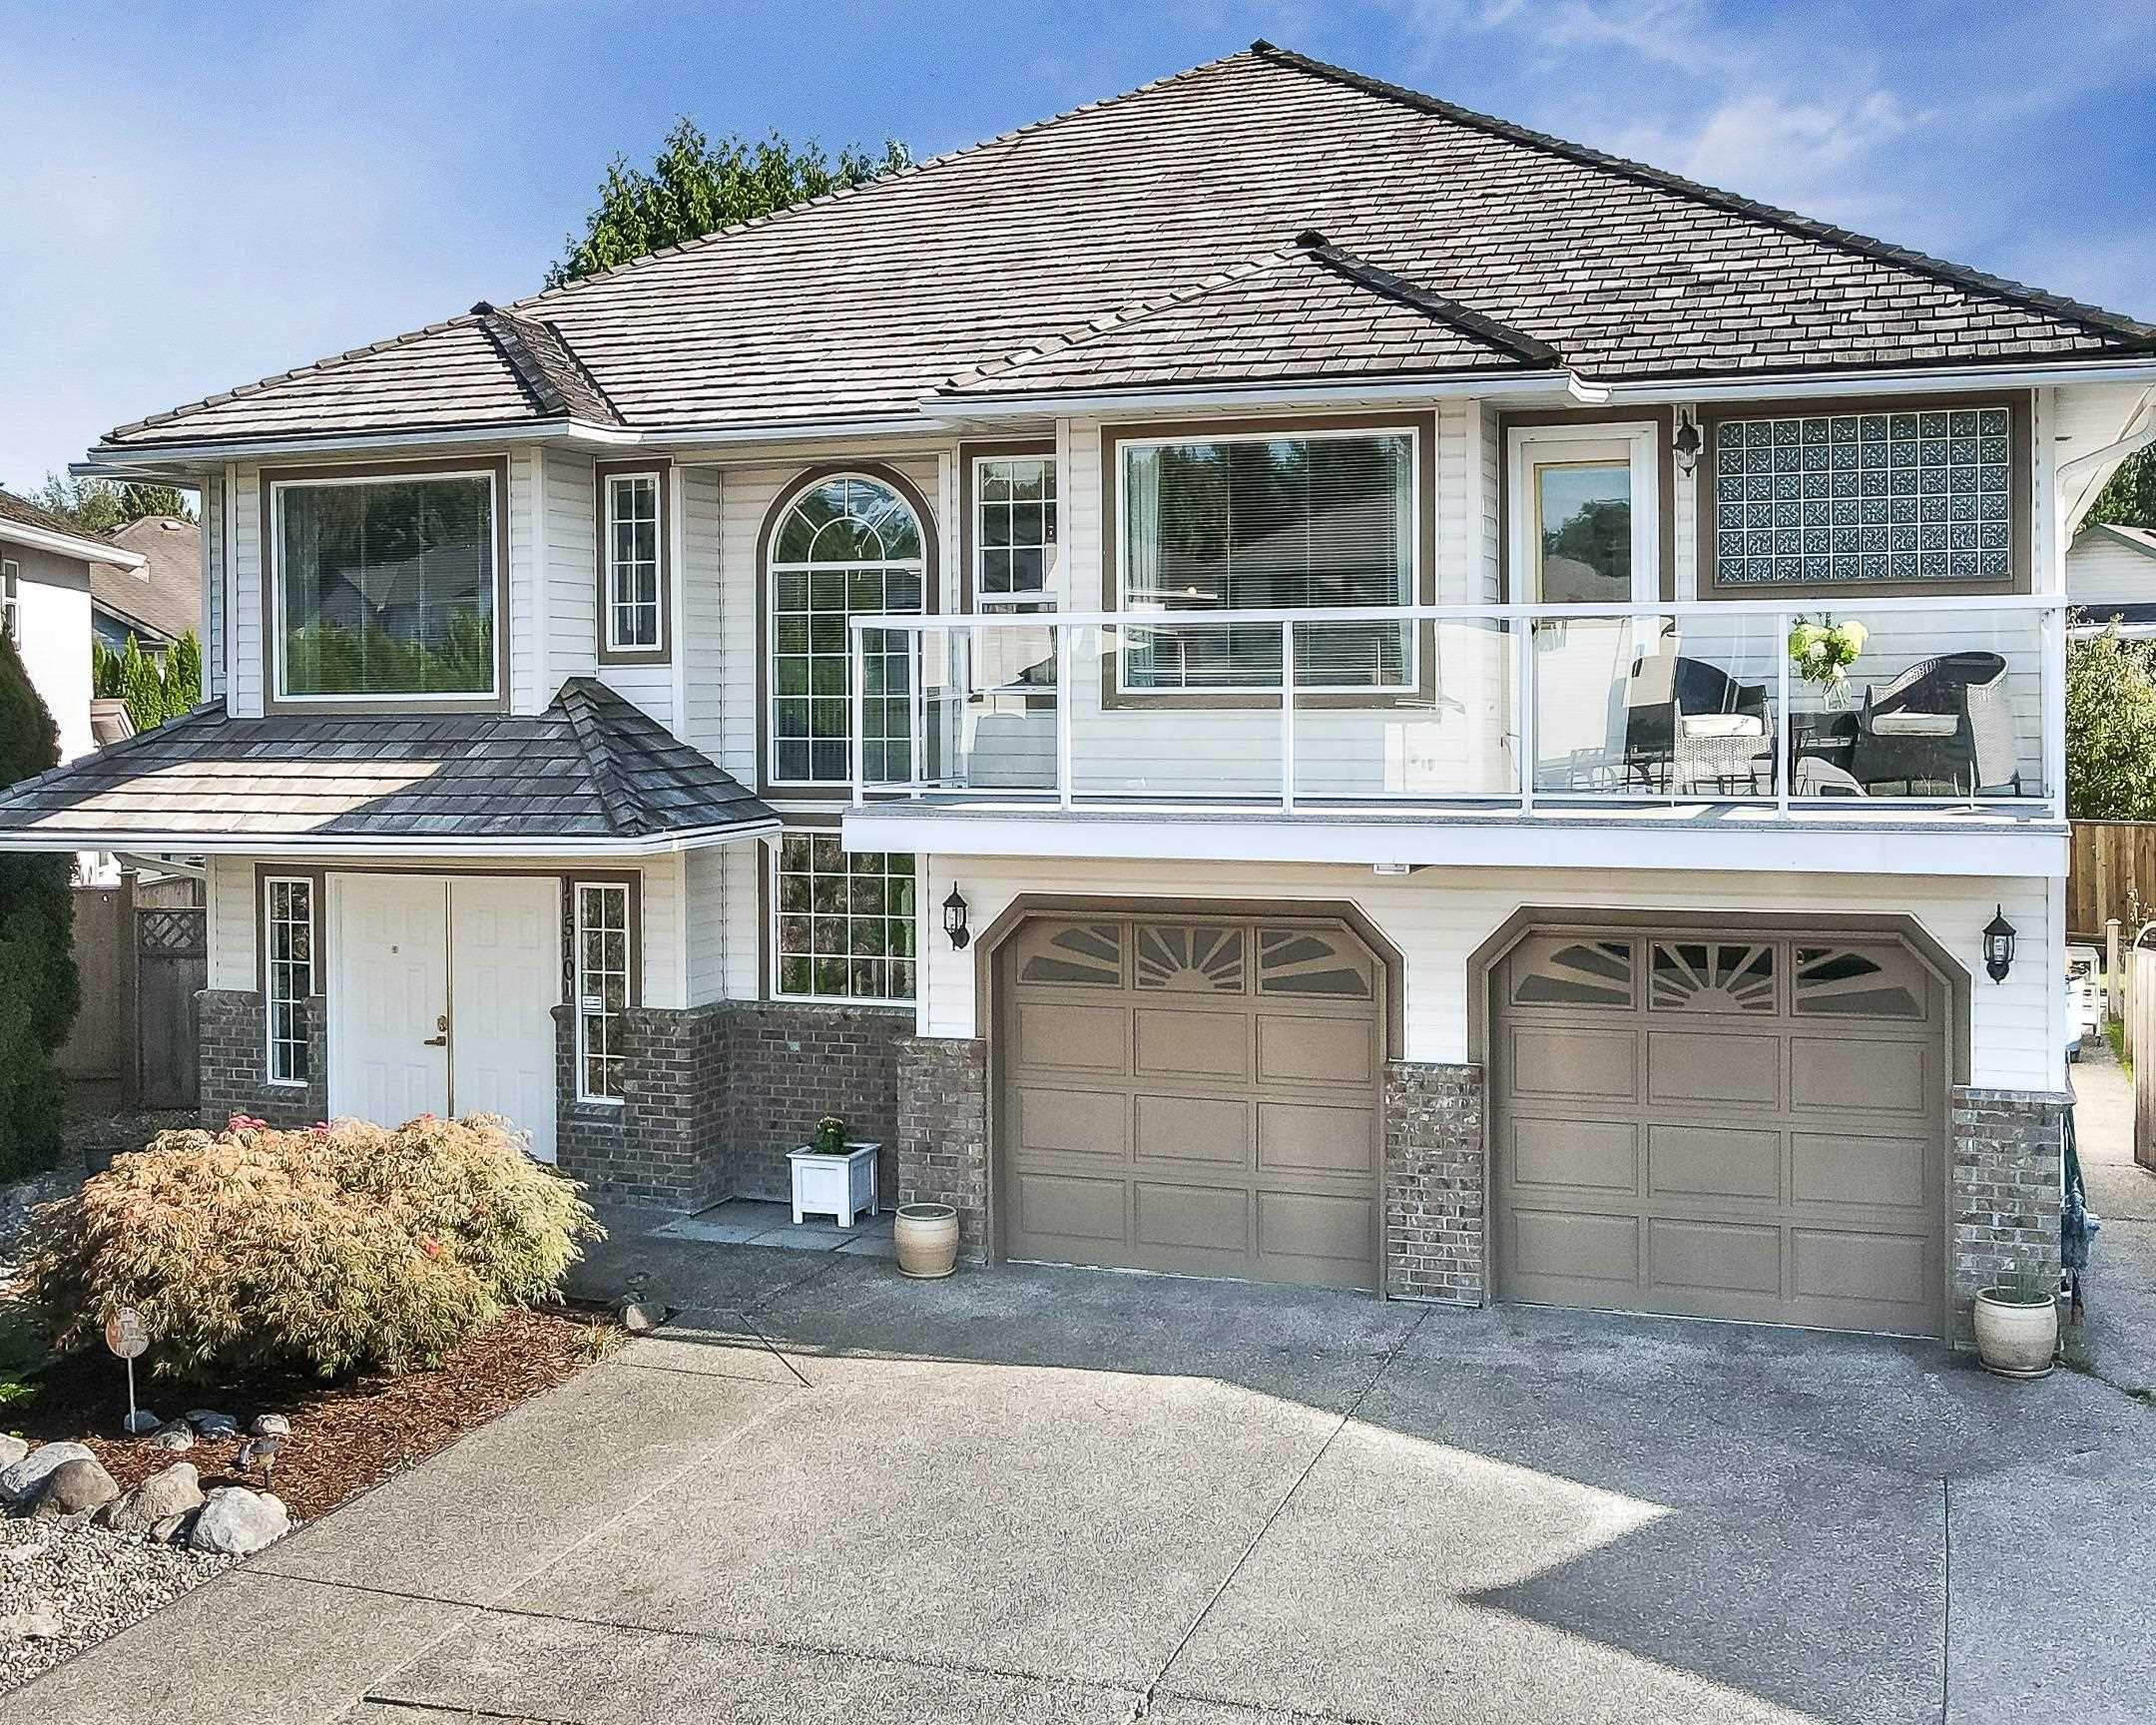 Main Photo: 11510 236B Street in Maple Ridge: Cottonwood MR House for sale : MLS®# R2616684